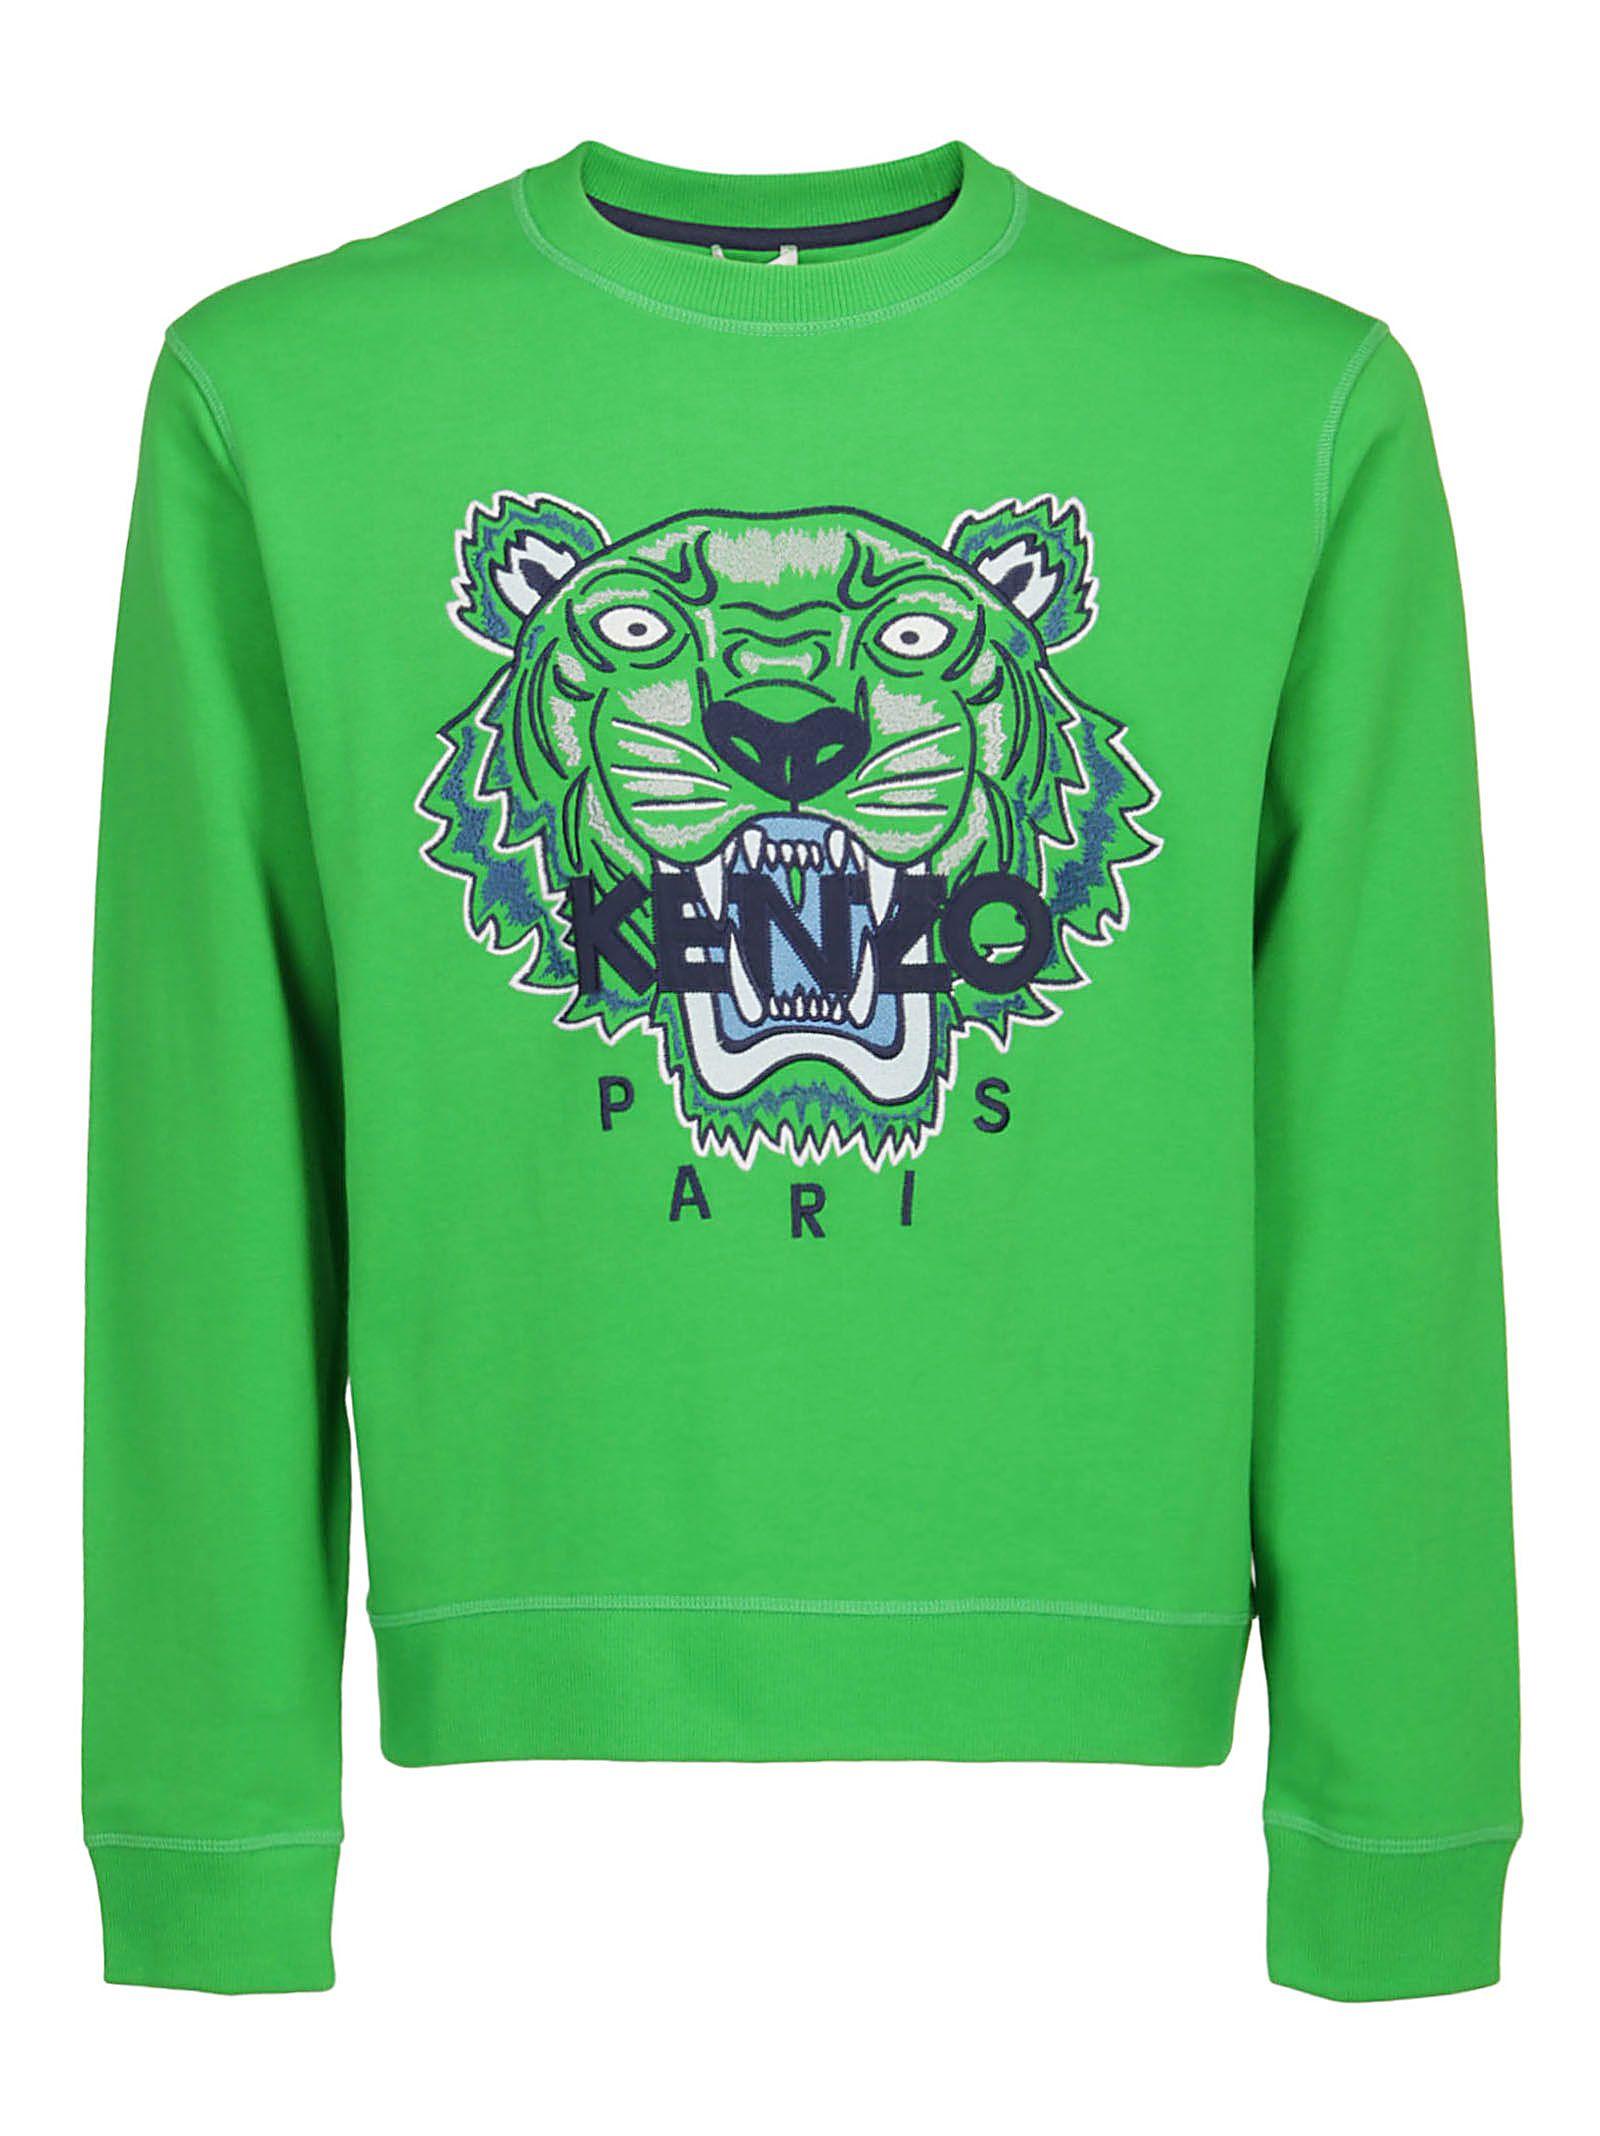 a5f852844 Kenzo Kenzo Sweatshirt - Grass green - 10954968   italist